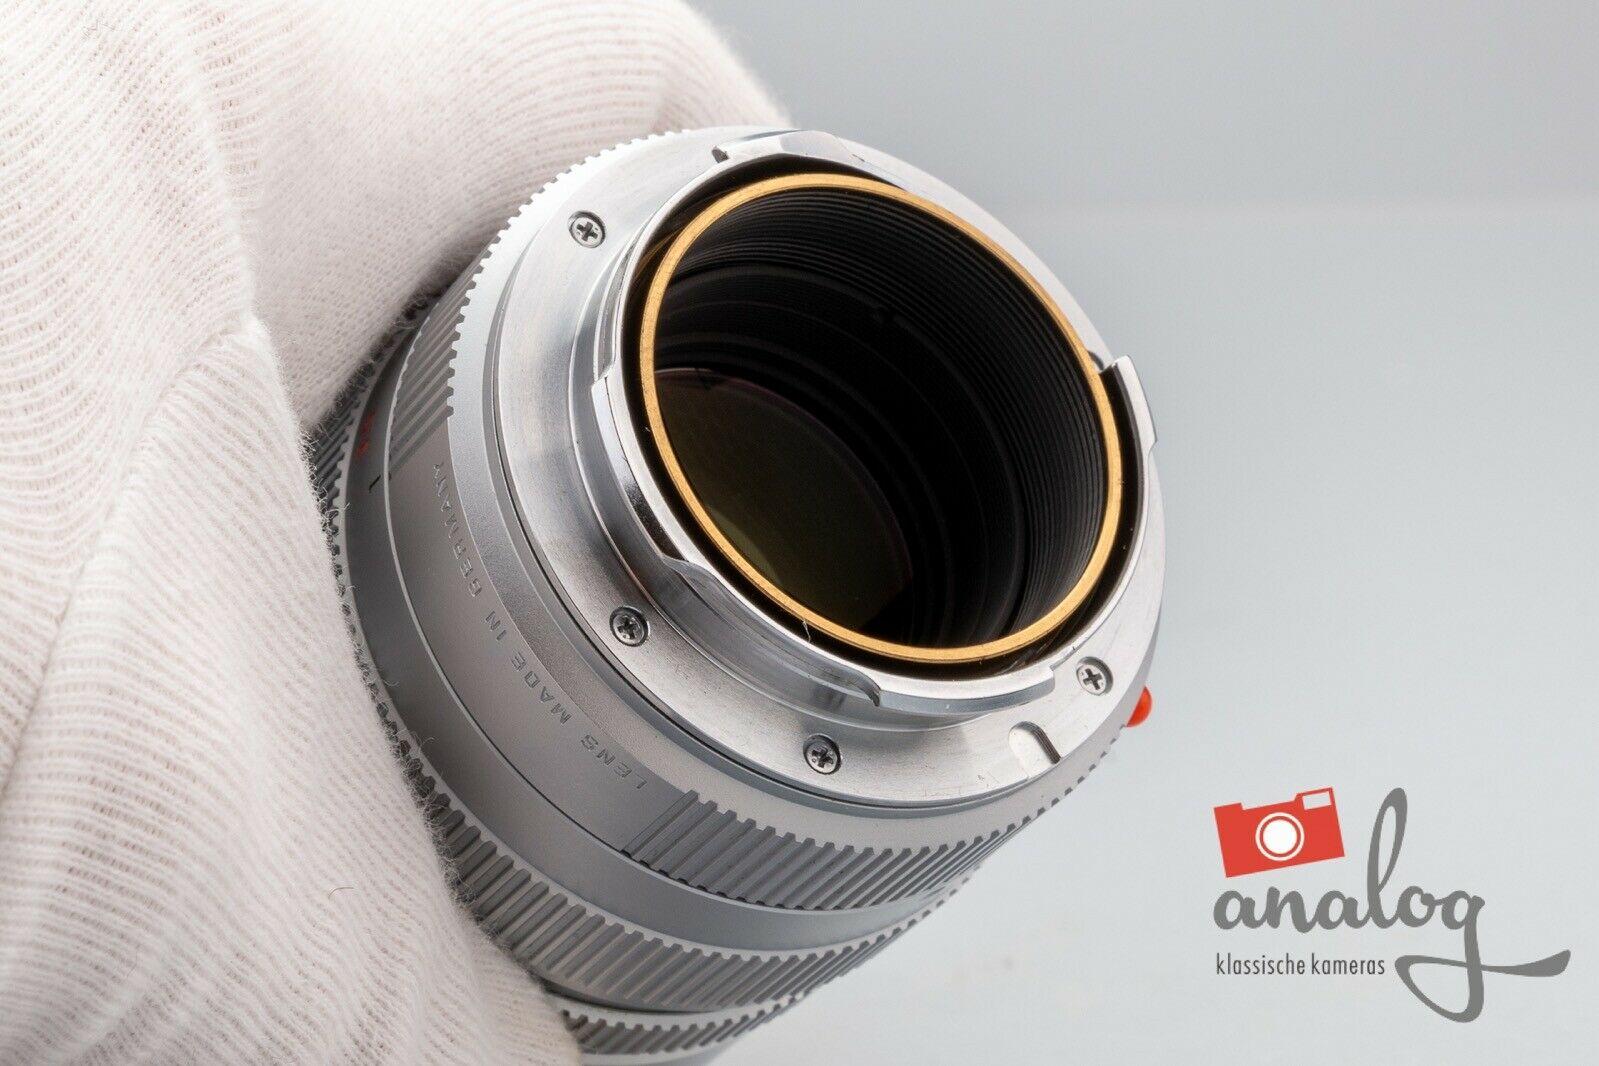 Leica Elmarit-M 90mm 2.8 silbern verchromt - 11808 - E46